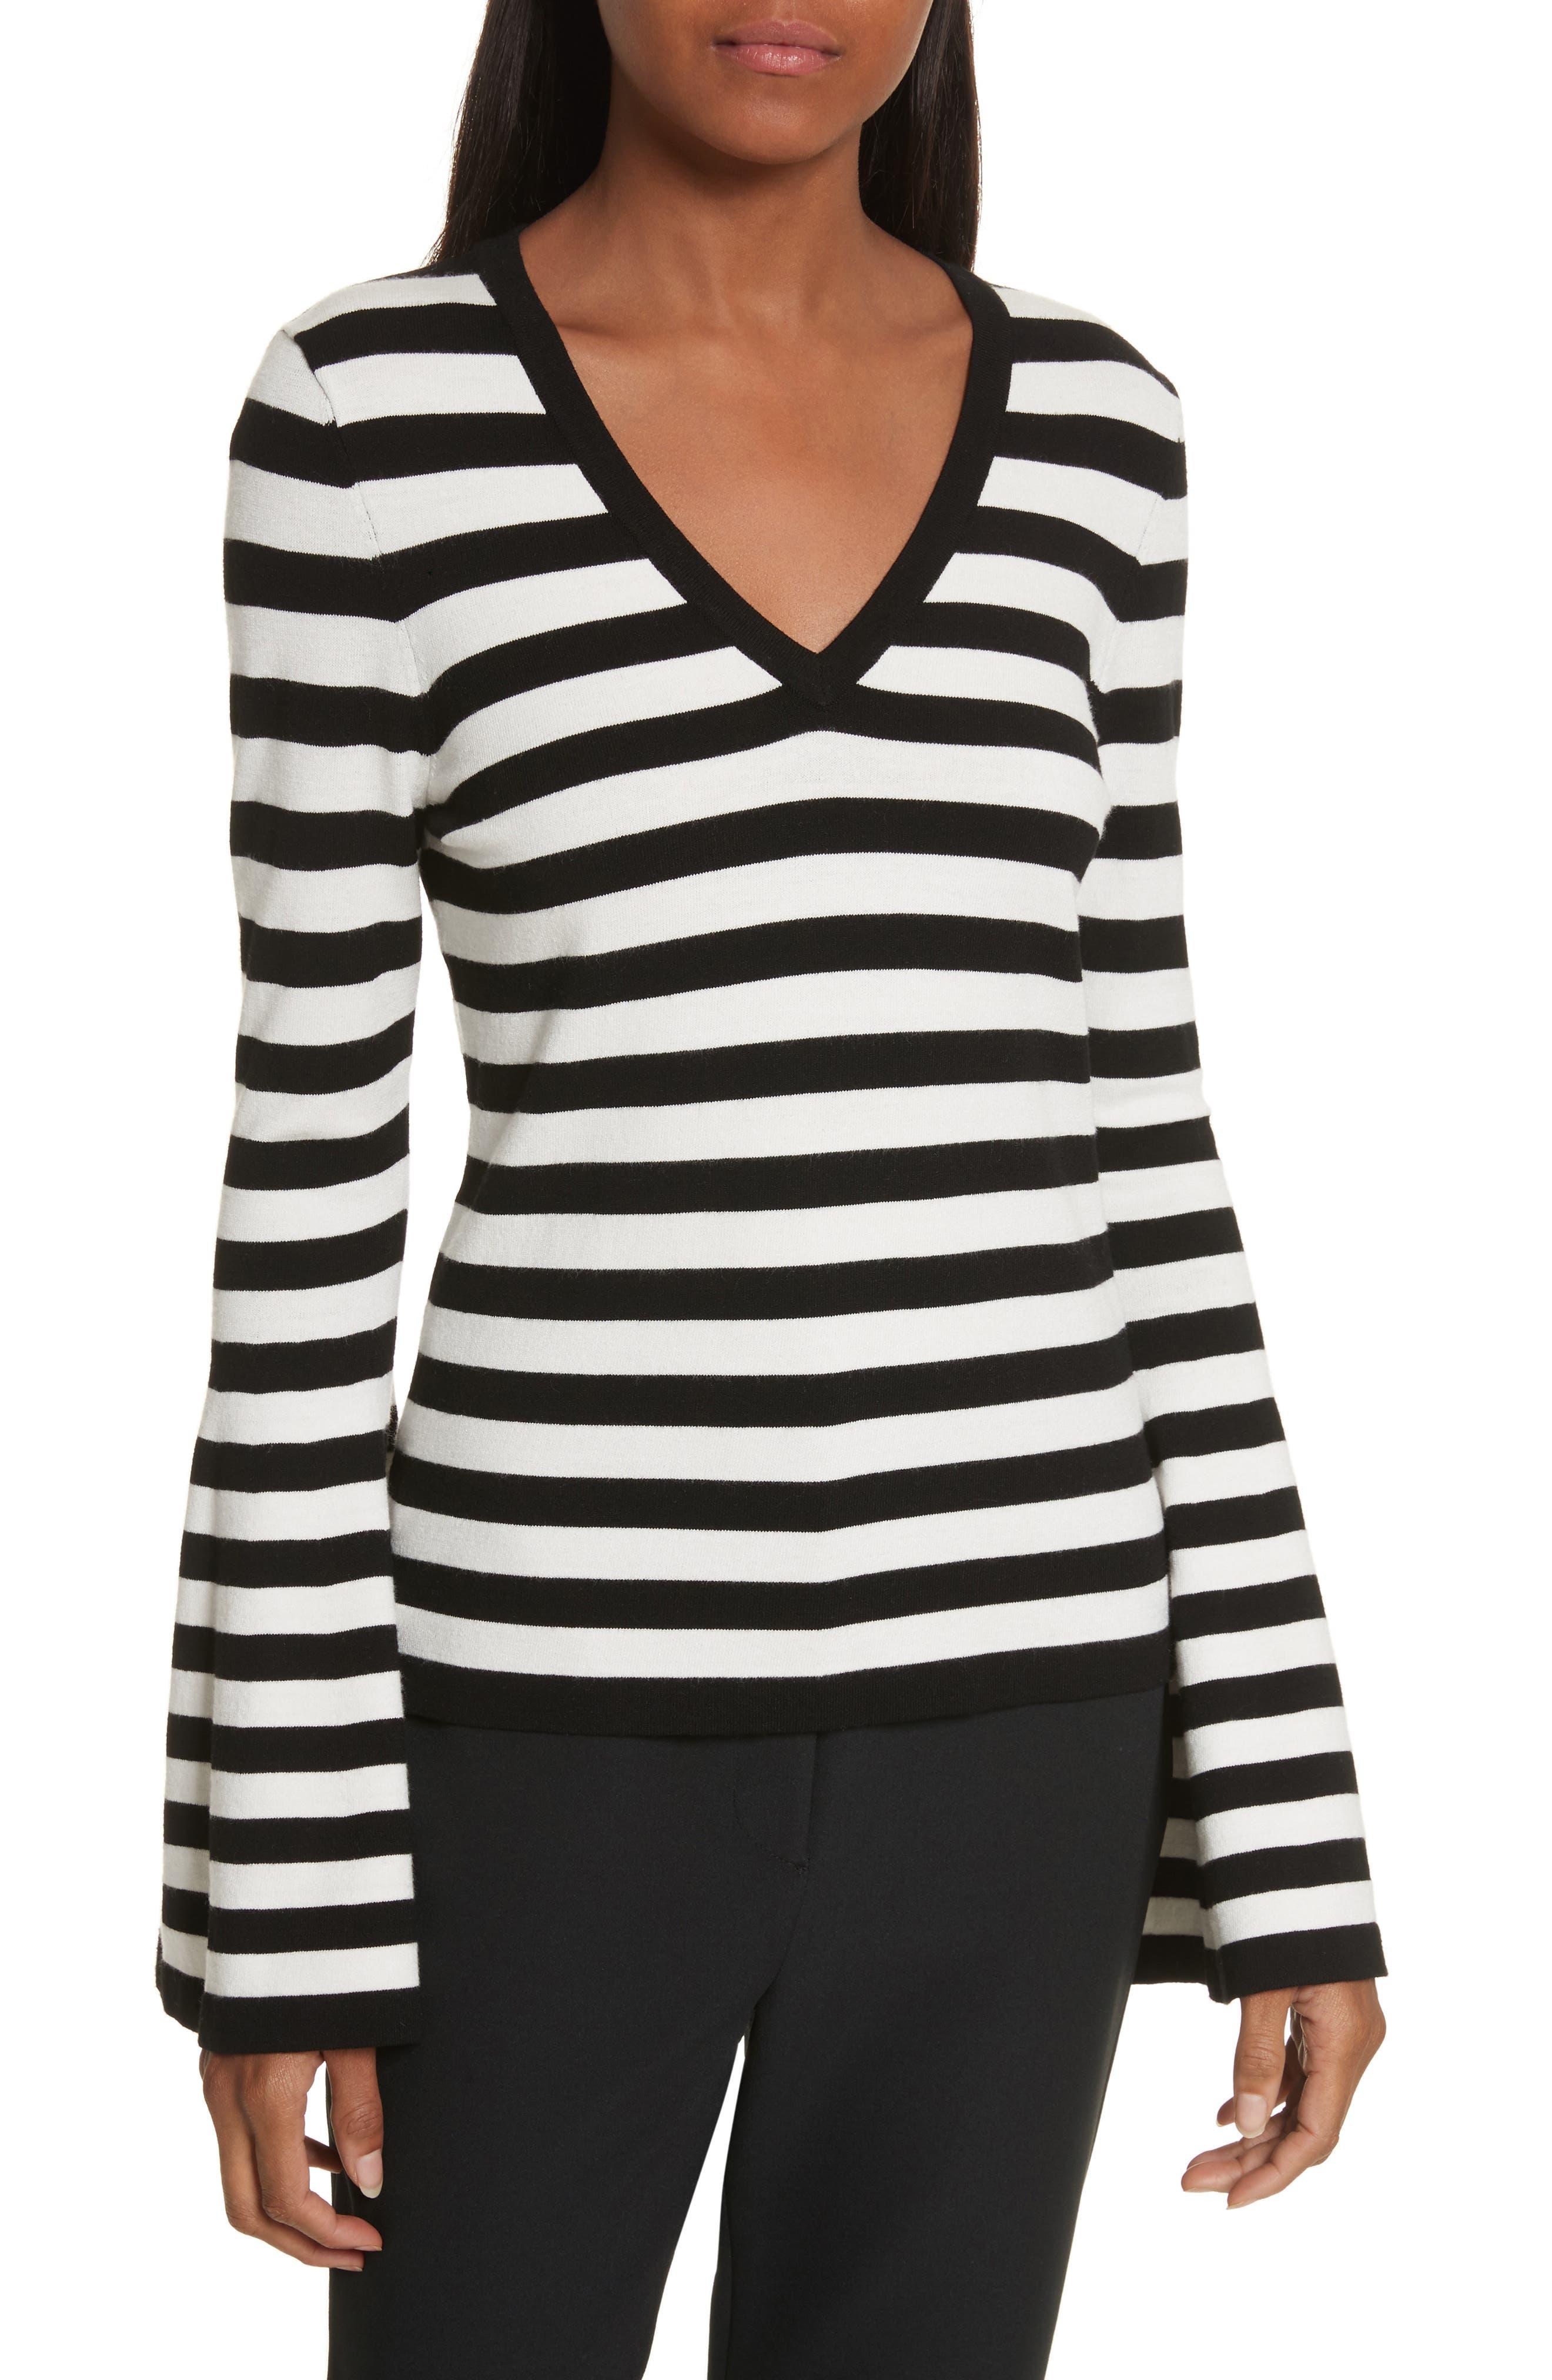 Alternate Image 1 Selected - Milly Bell Sleeve V-Neck Sweater